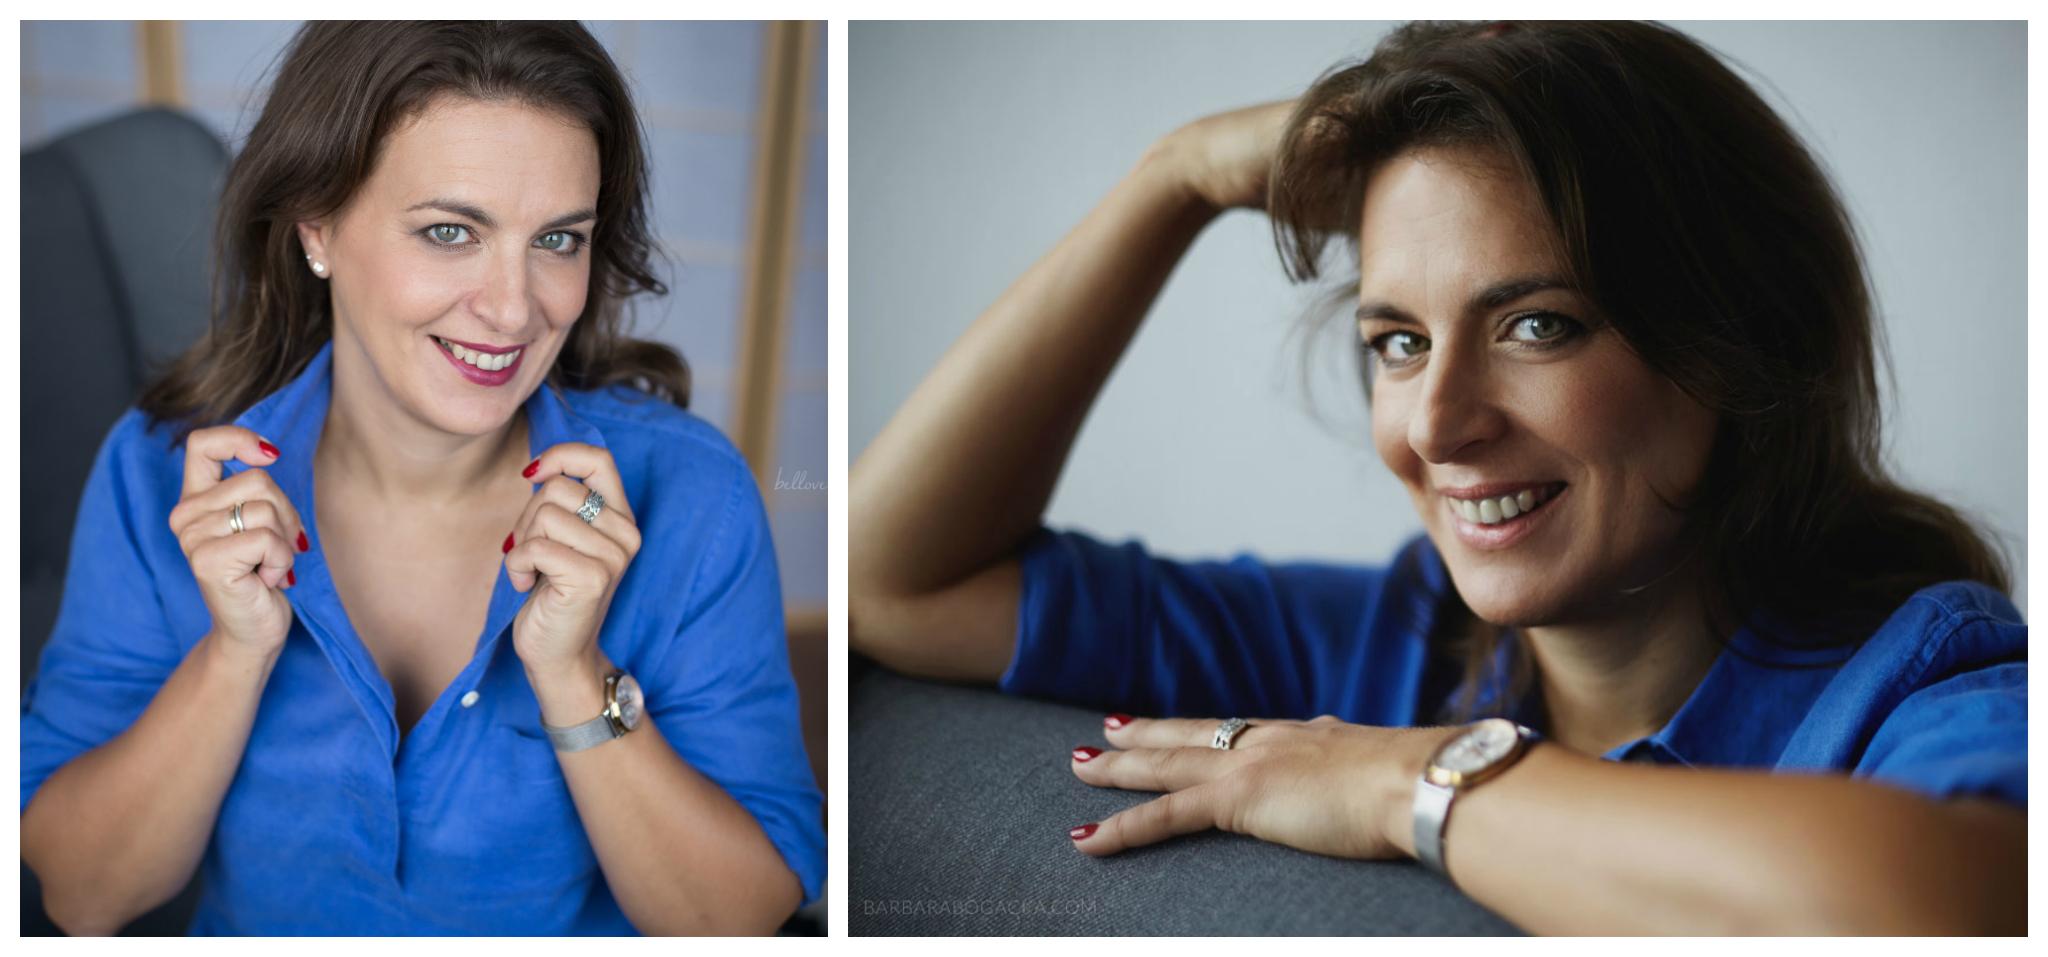 bogacka-fotografia-dwa-portrety